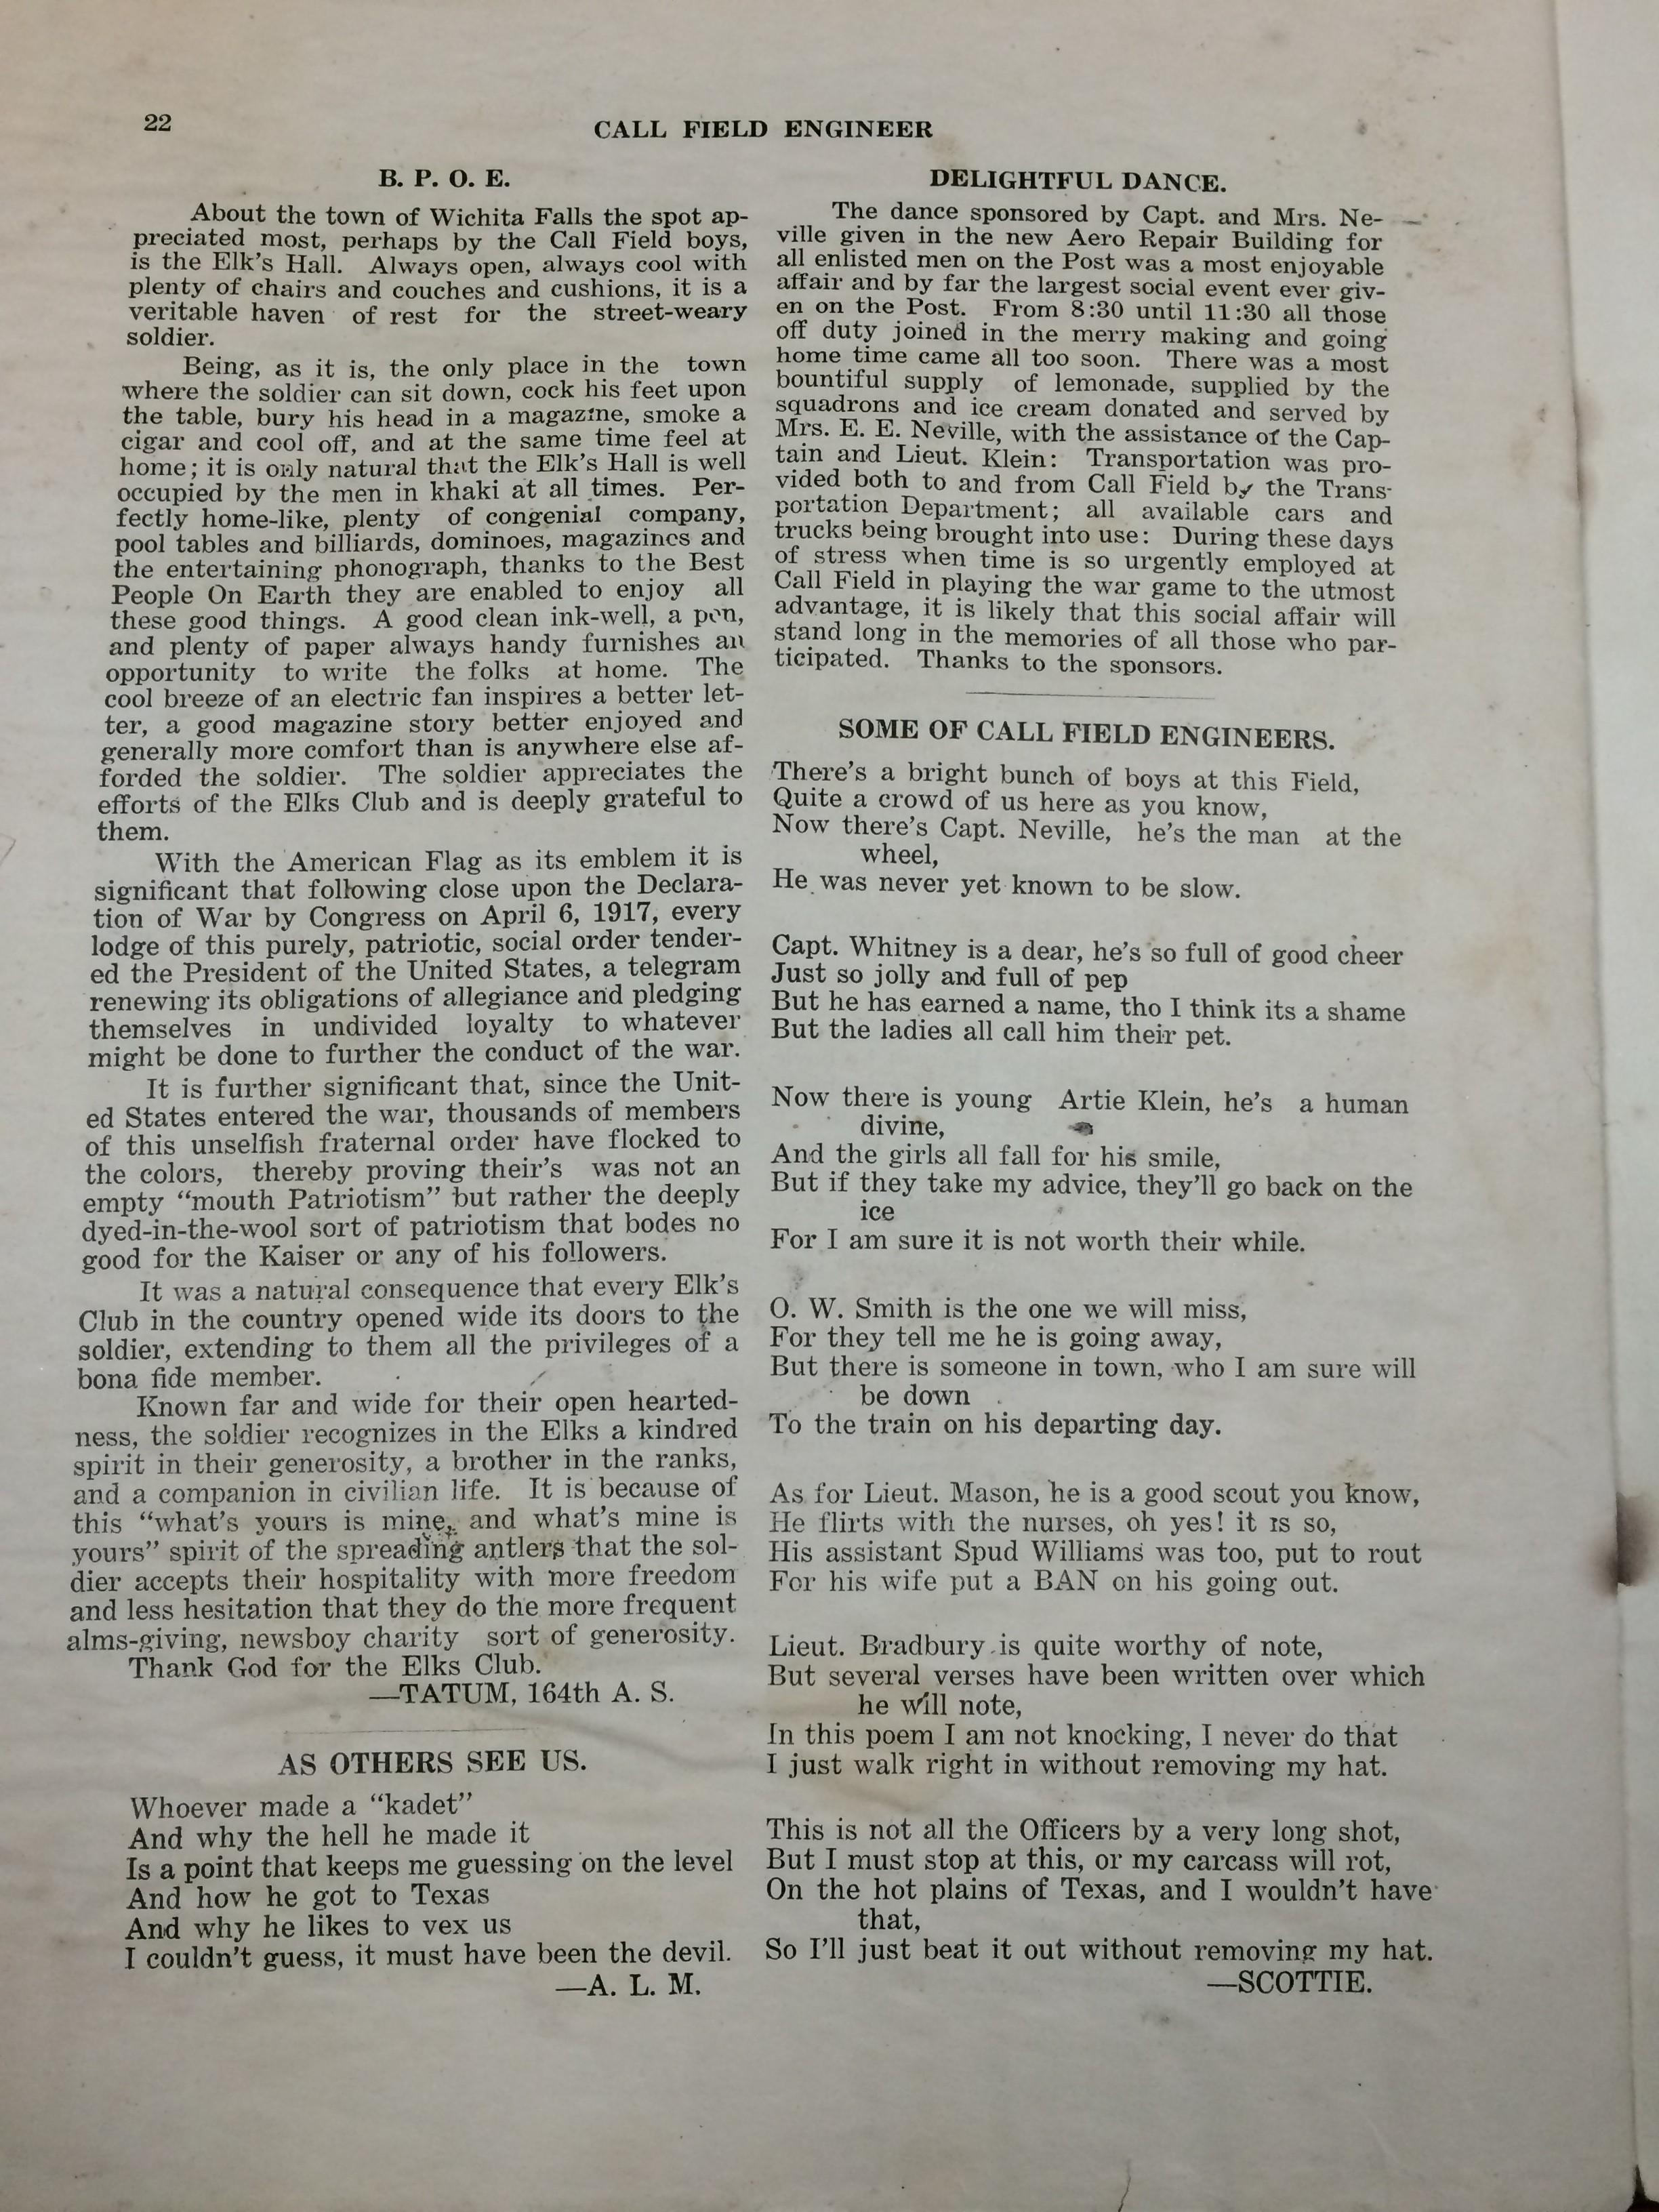 Image 24 July 1918 Call Field Engineer